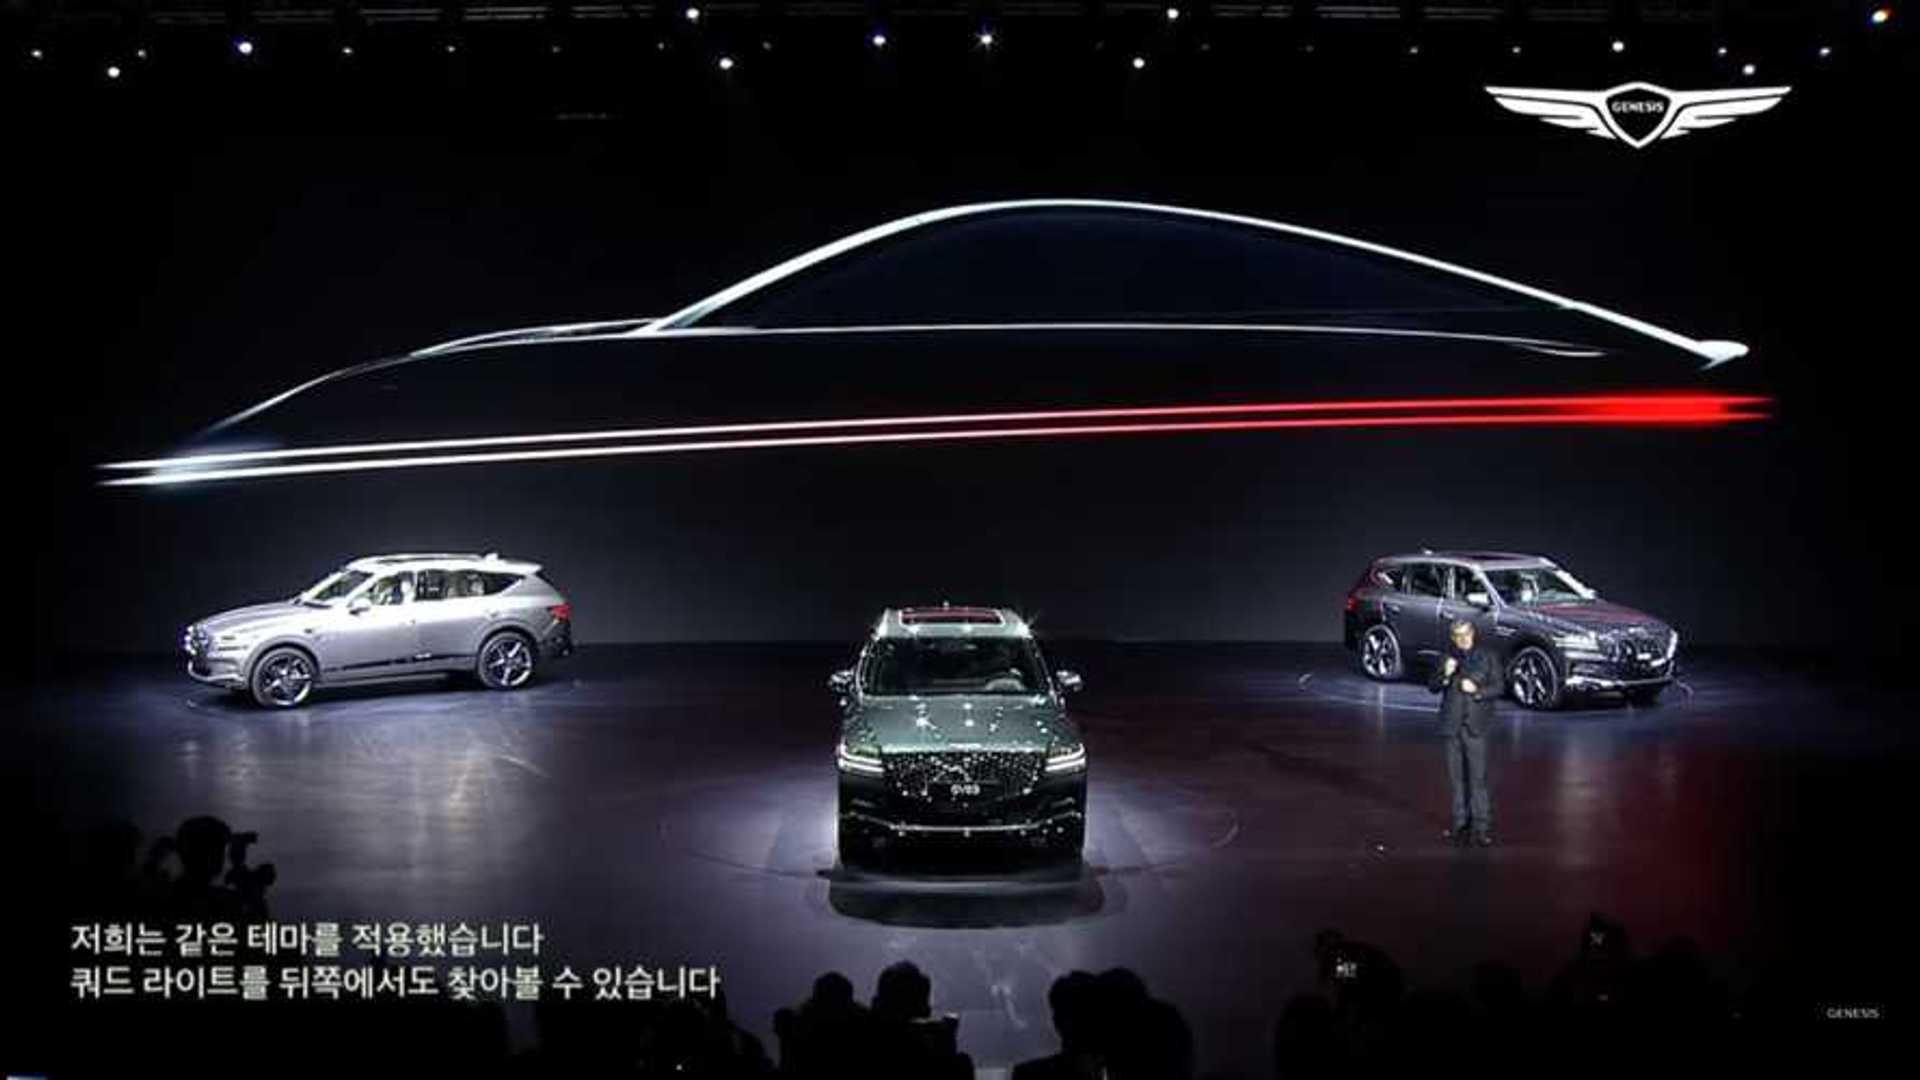 Genesis teases six-model lineup, including sleek coupe